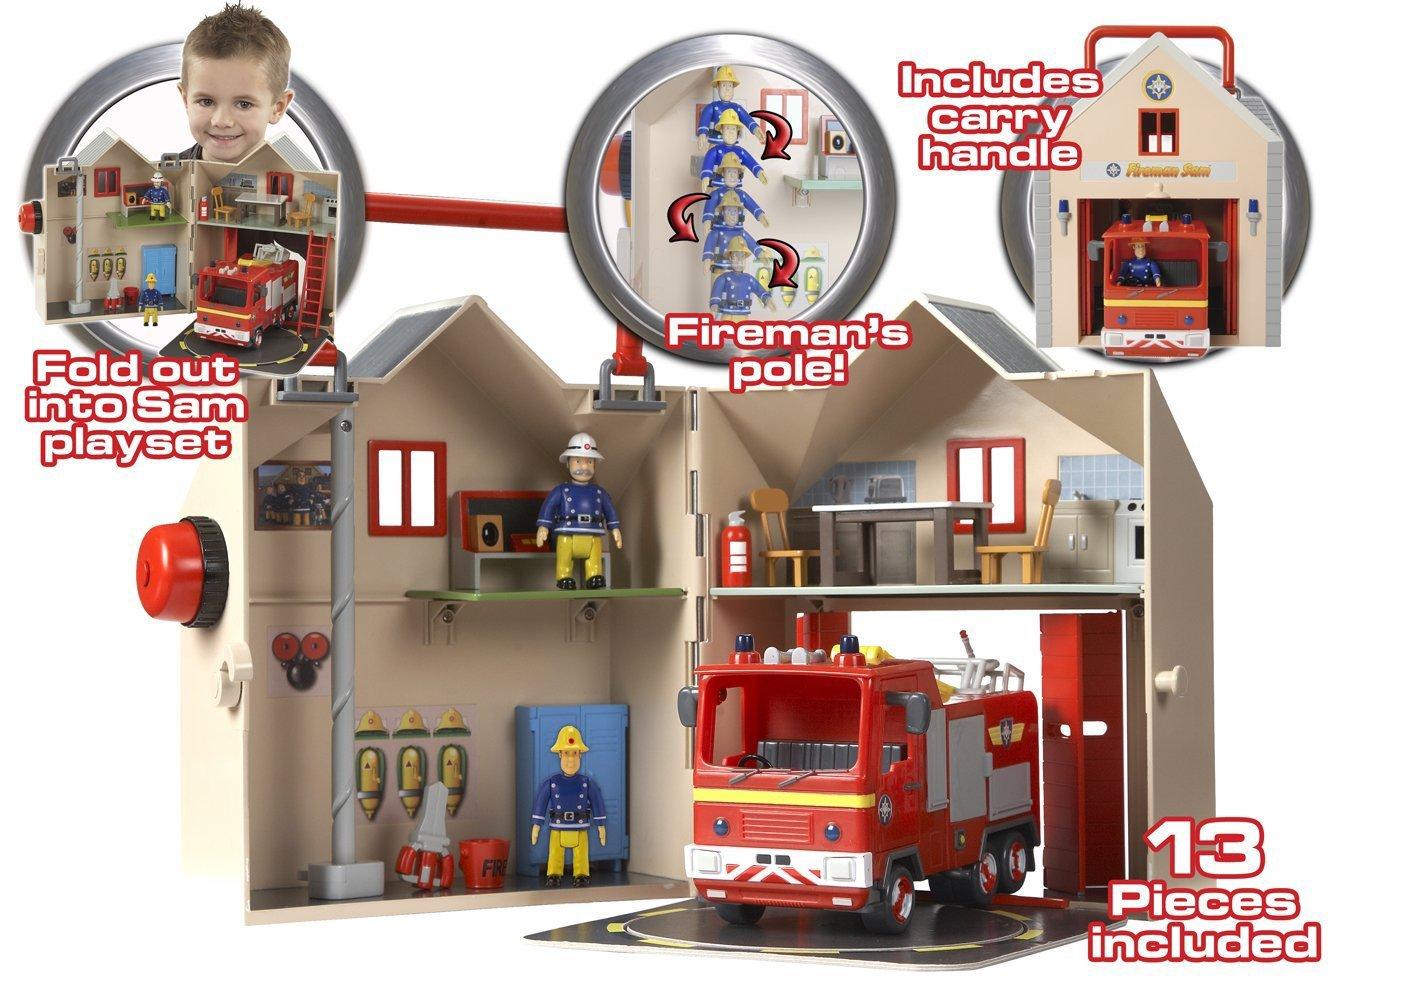 Fireman Sam Deluxe Fire Station Playset & Fire Engine Jupiter Set